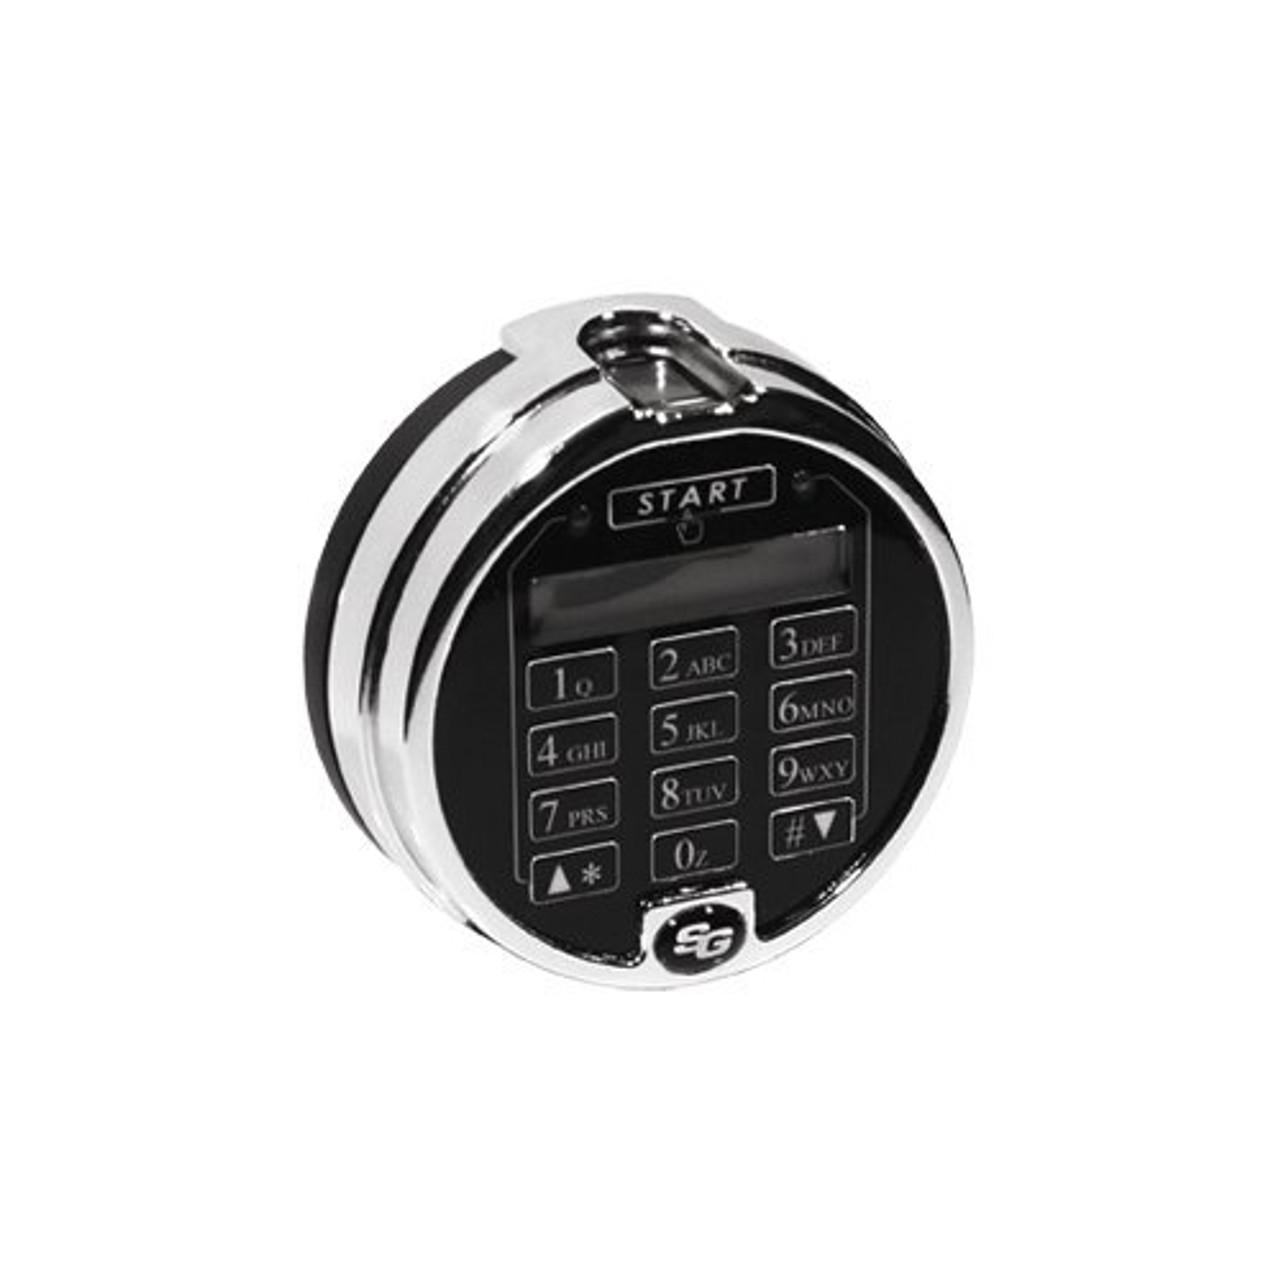 Sargent And Greenleaf 6120 410 Biometric Keypad